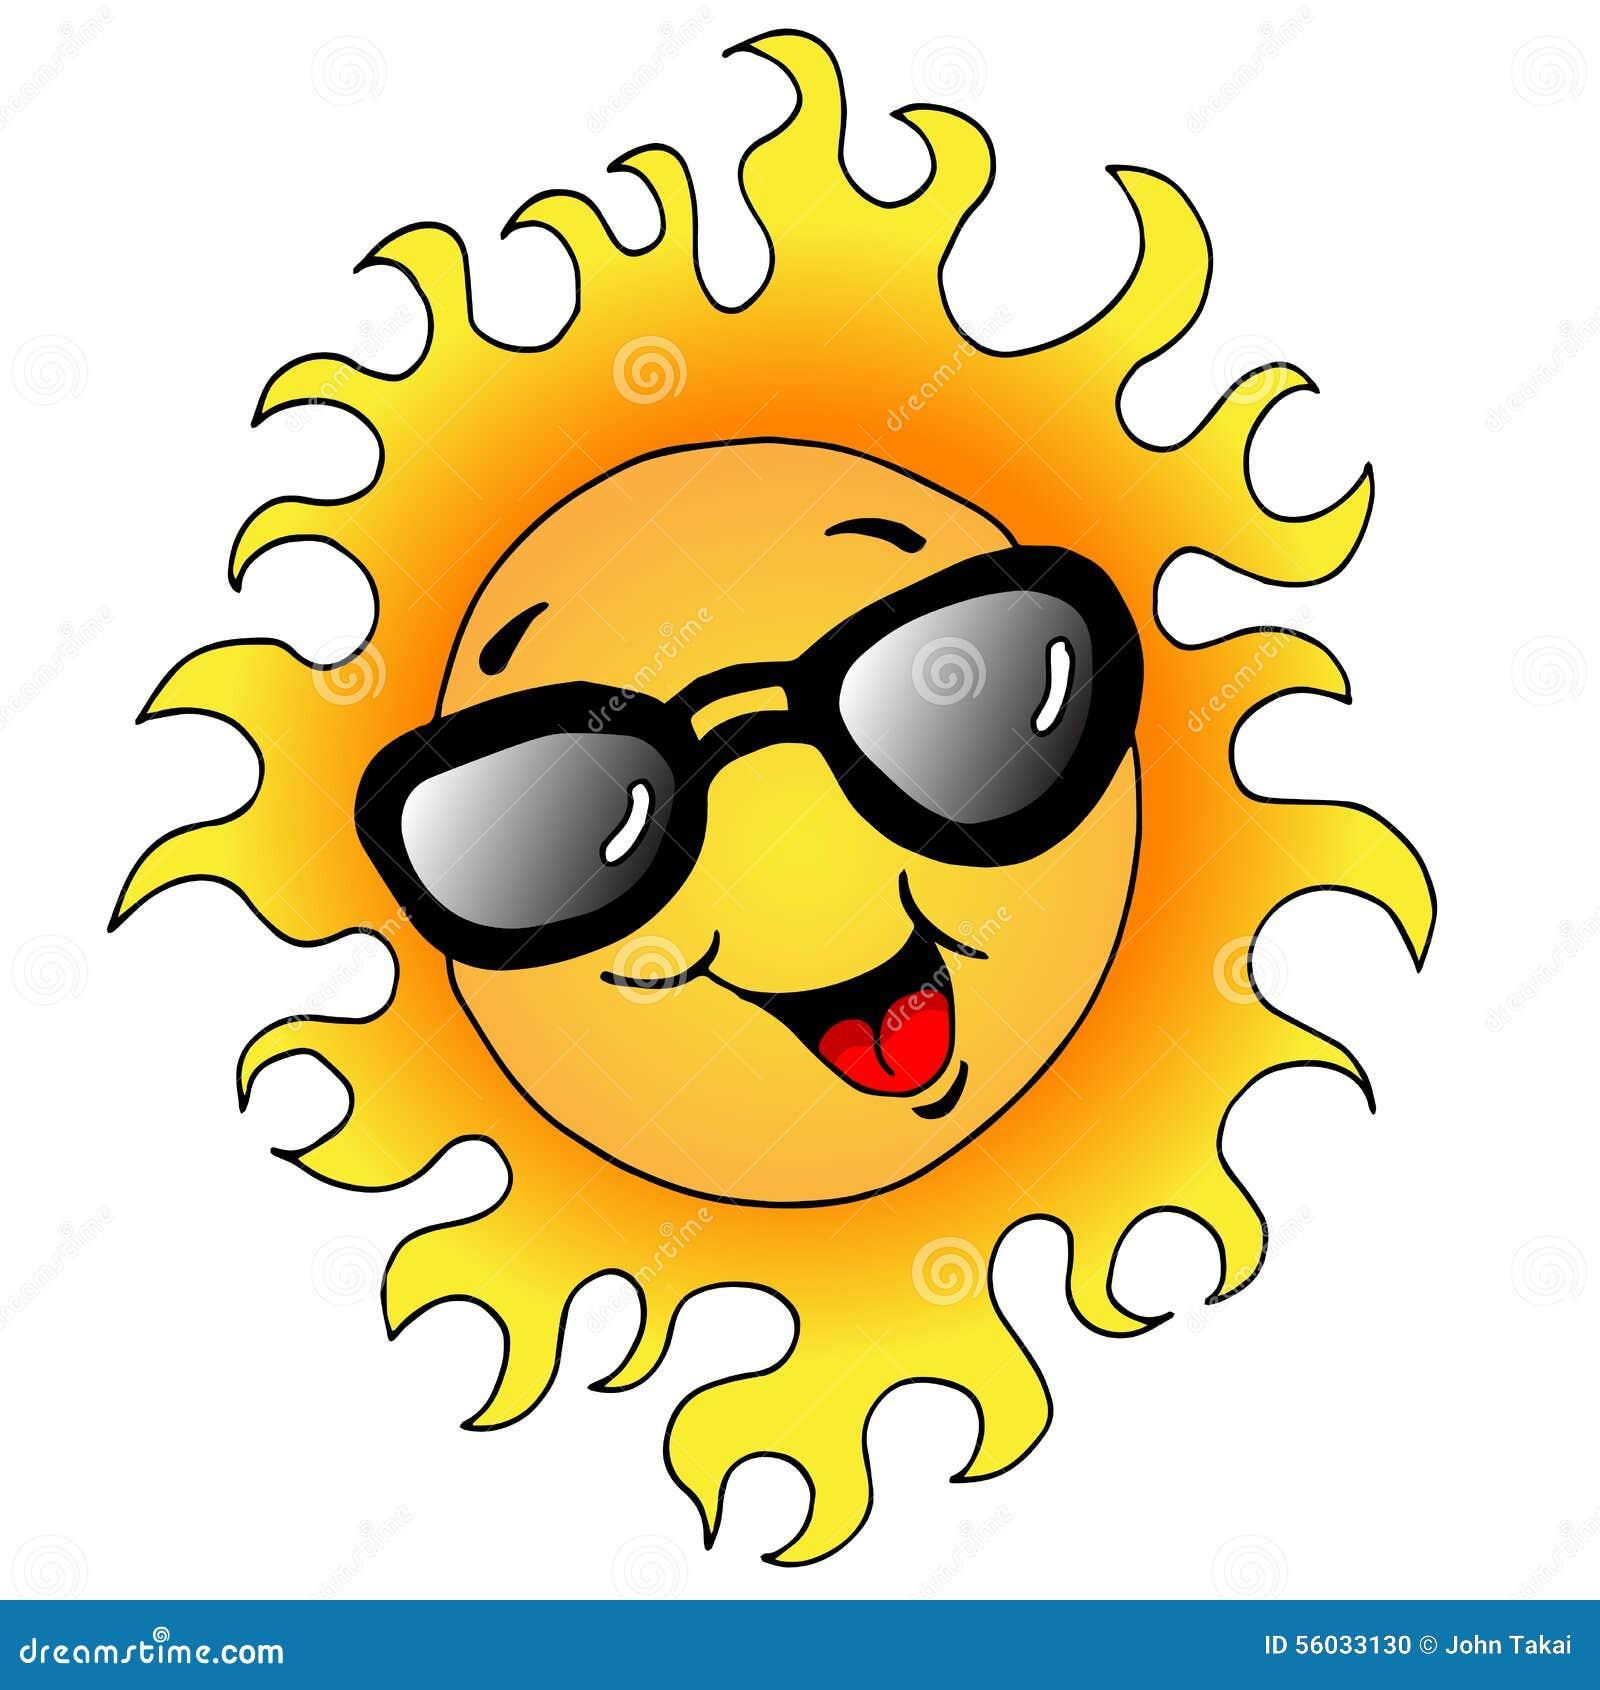 Happy Sun With Sunglasses Stock Vector - Image: 56033130